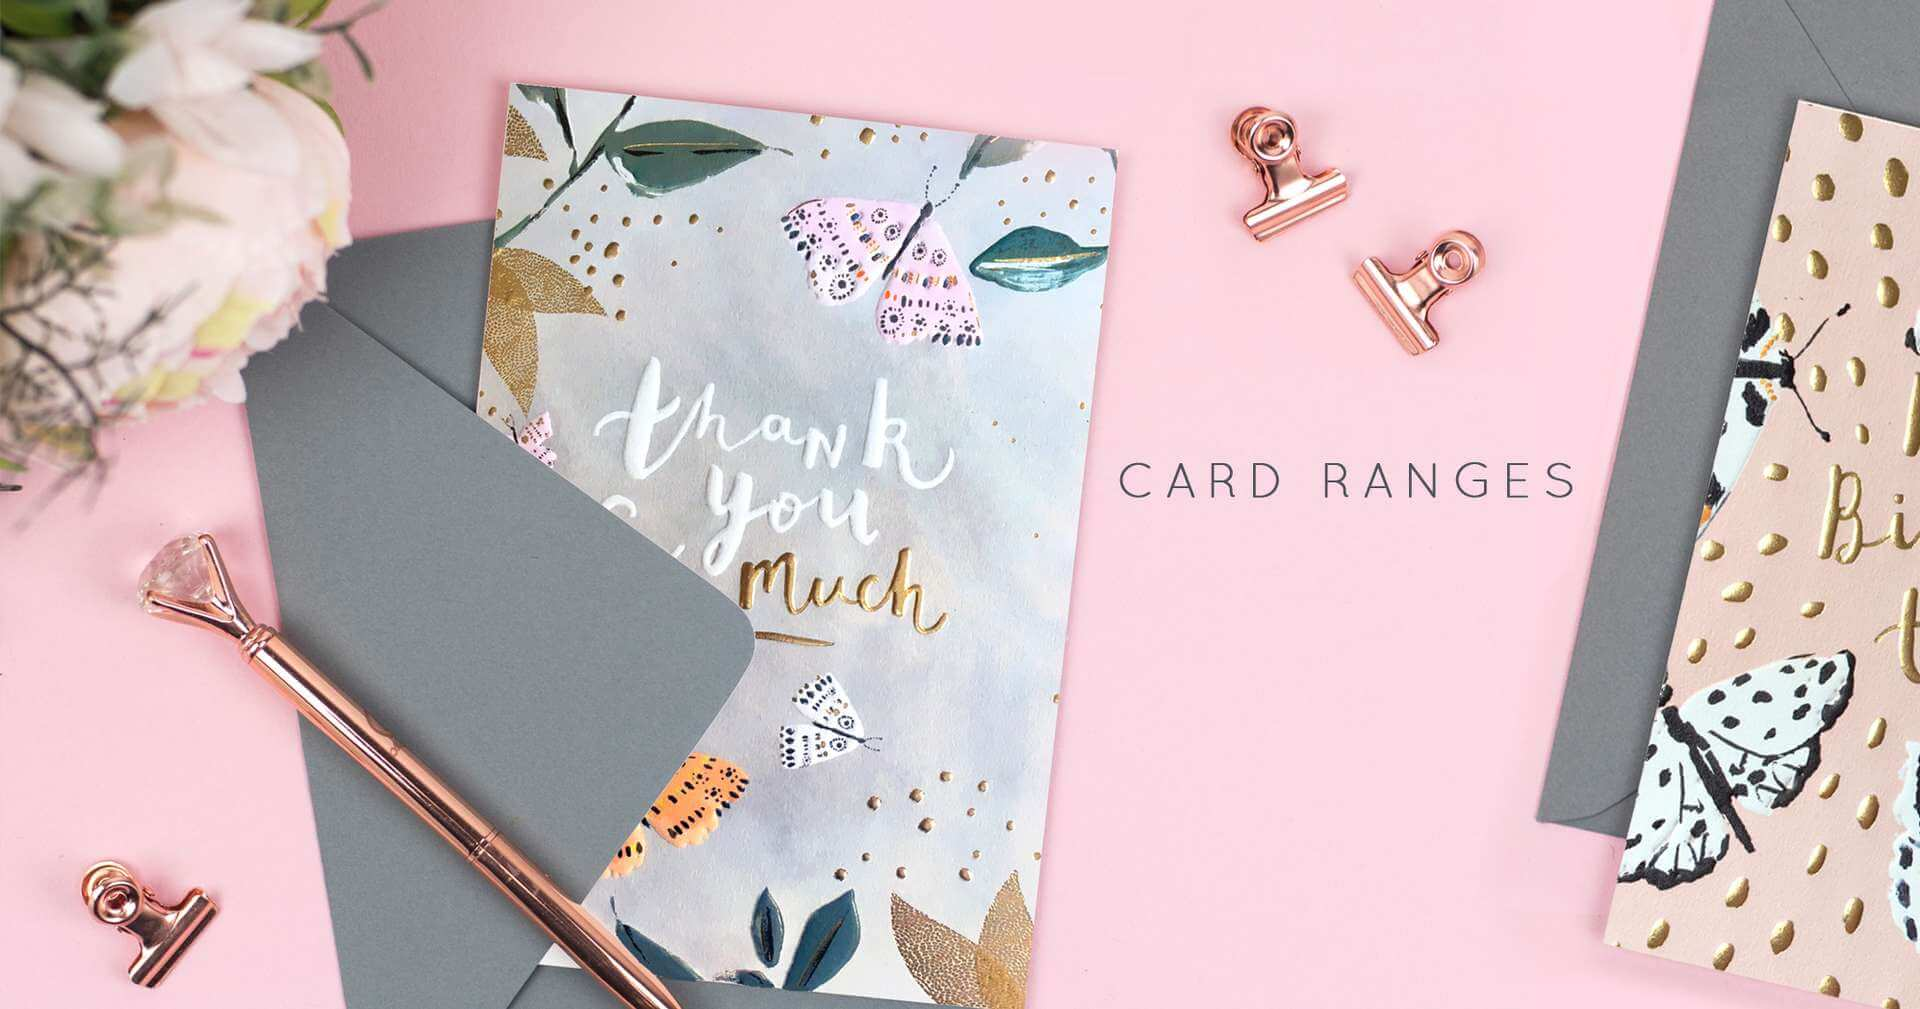 CARD RANGES header